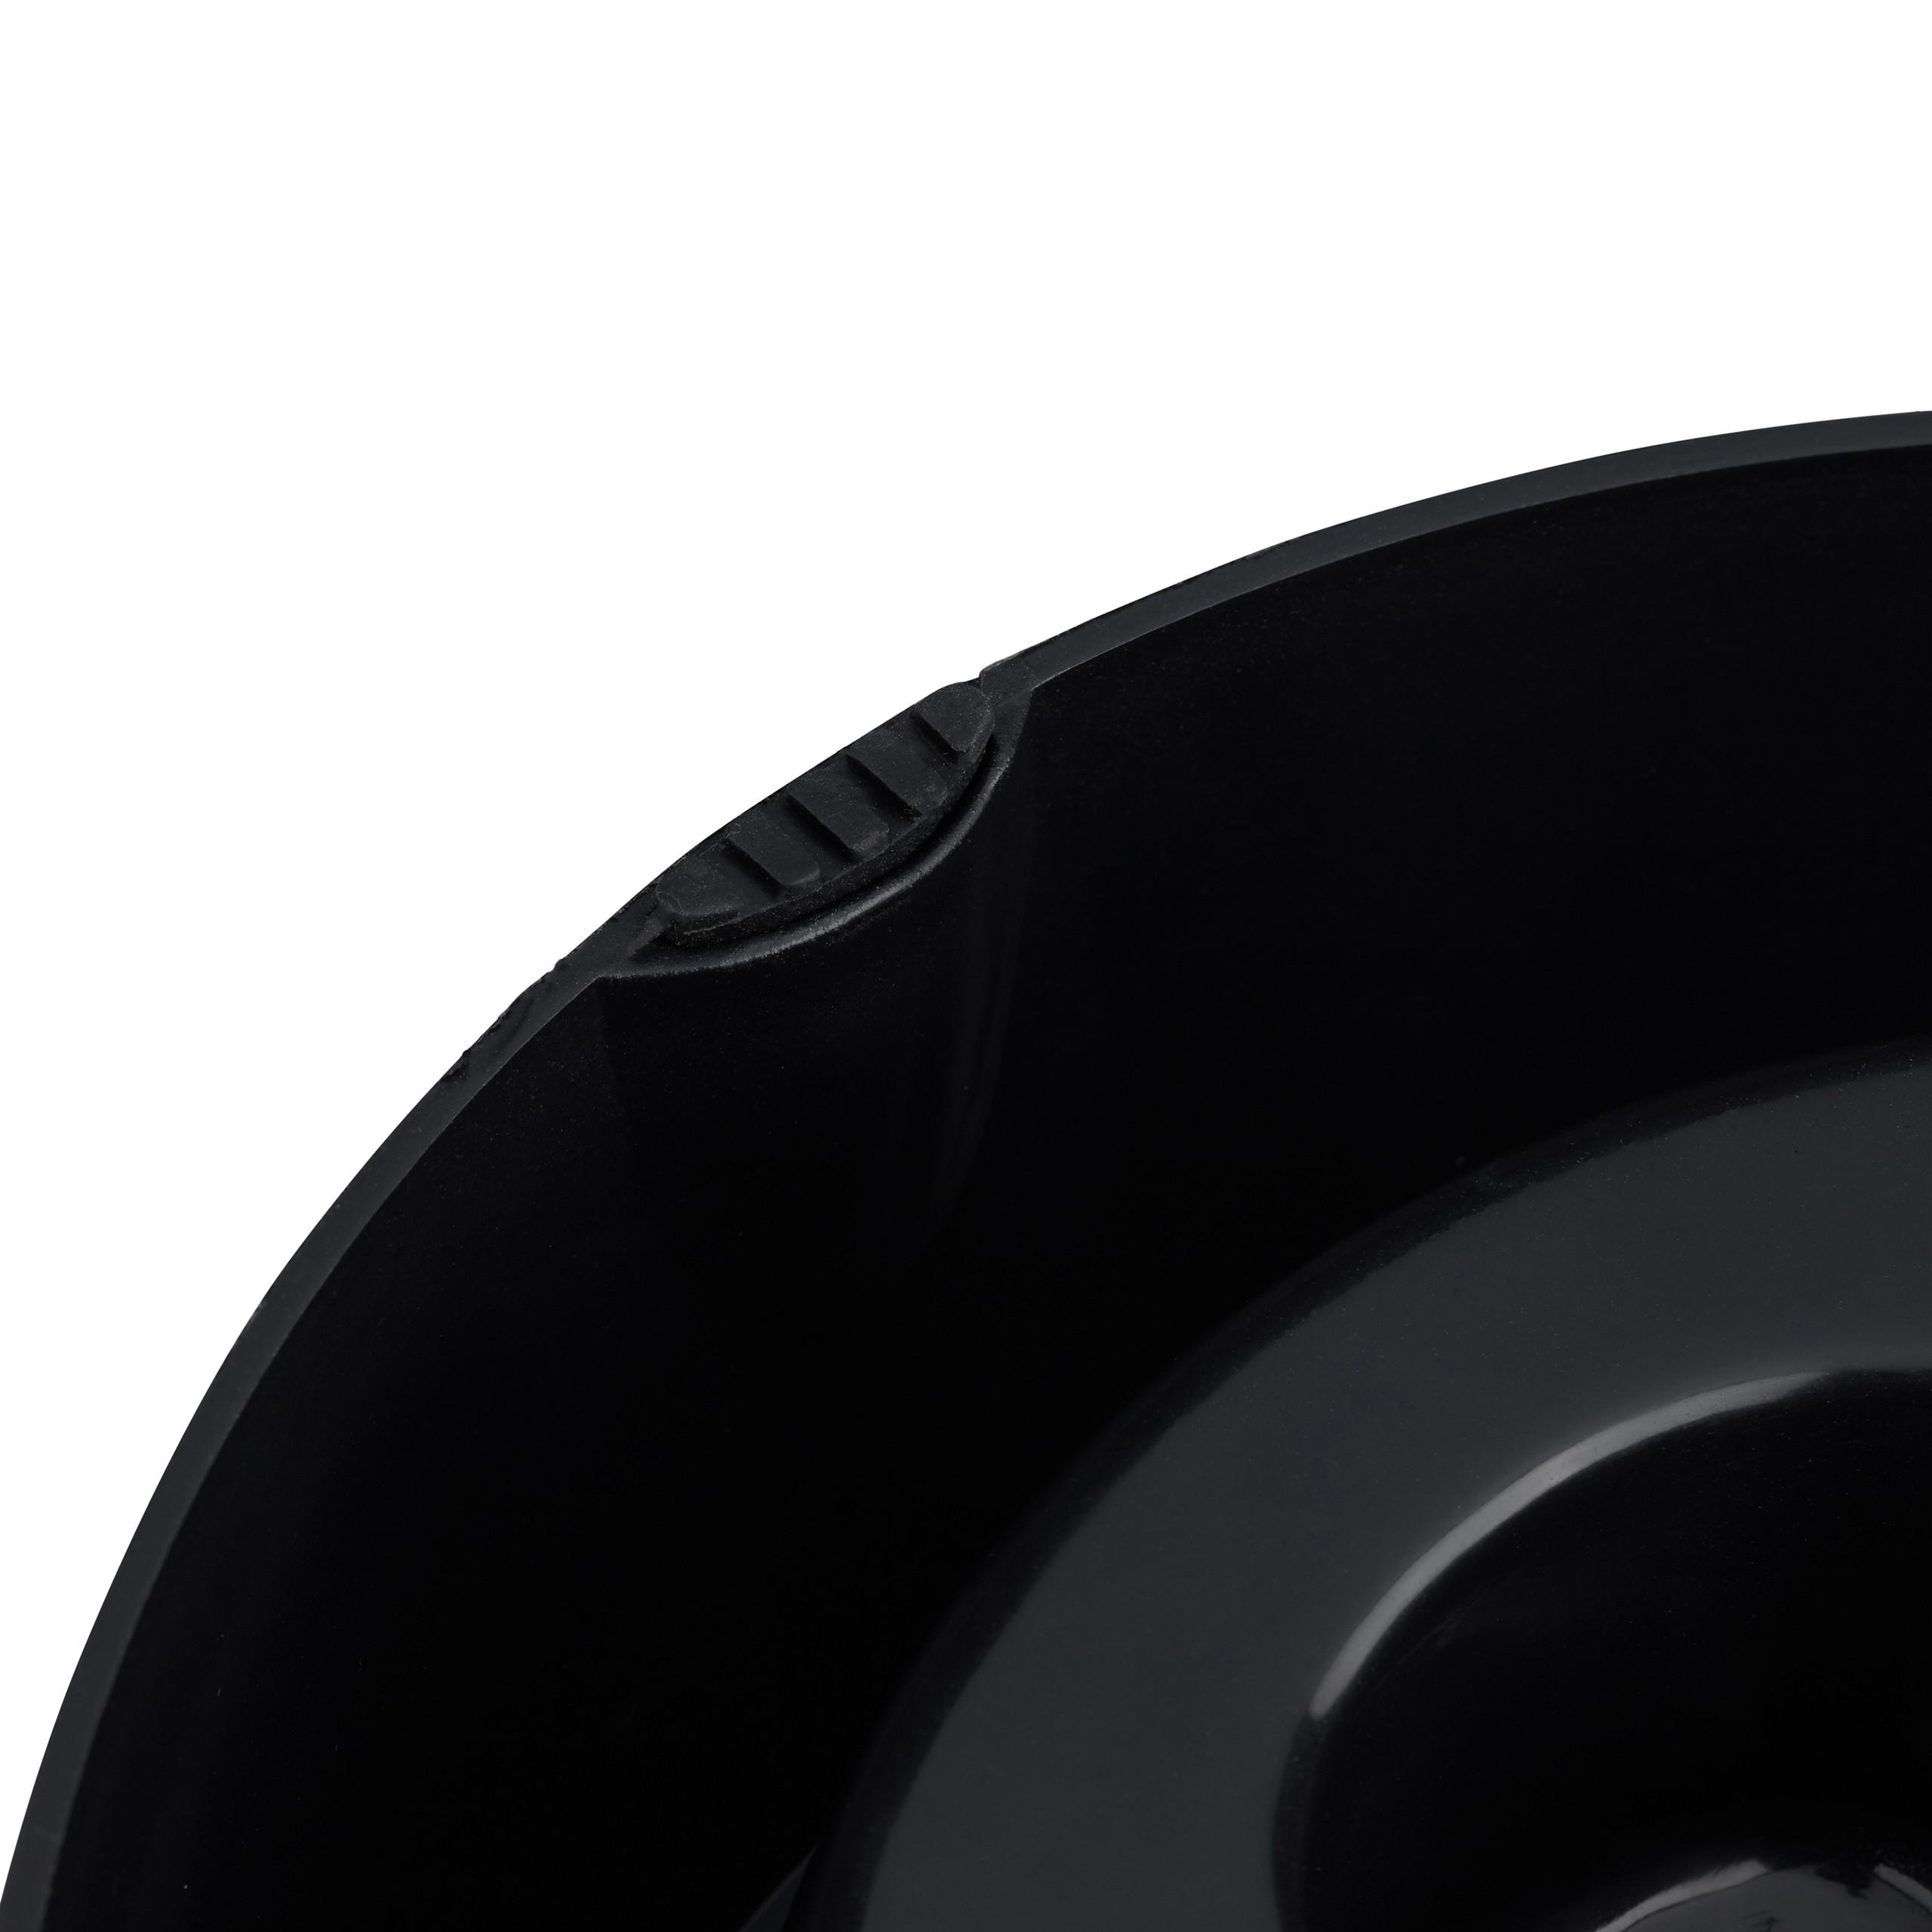 Indexbild 14 - Anti Schling Napf Hundenapf Großer Fressnapf Langsames Fressen Futternapf rund